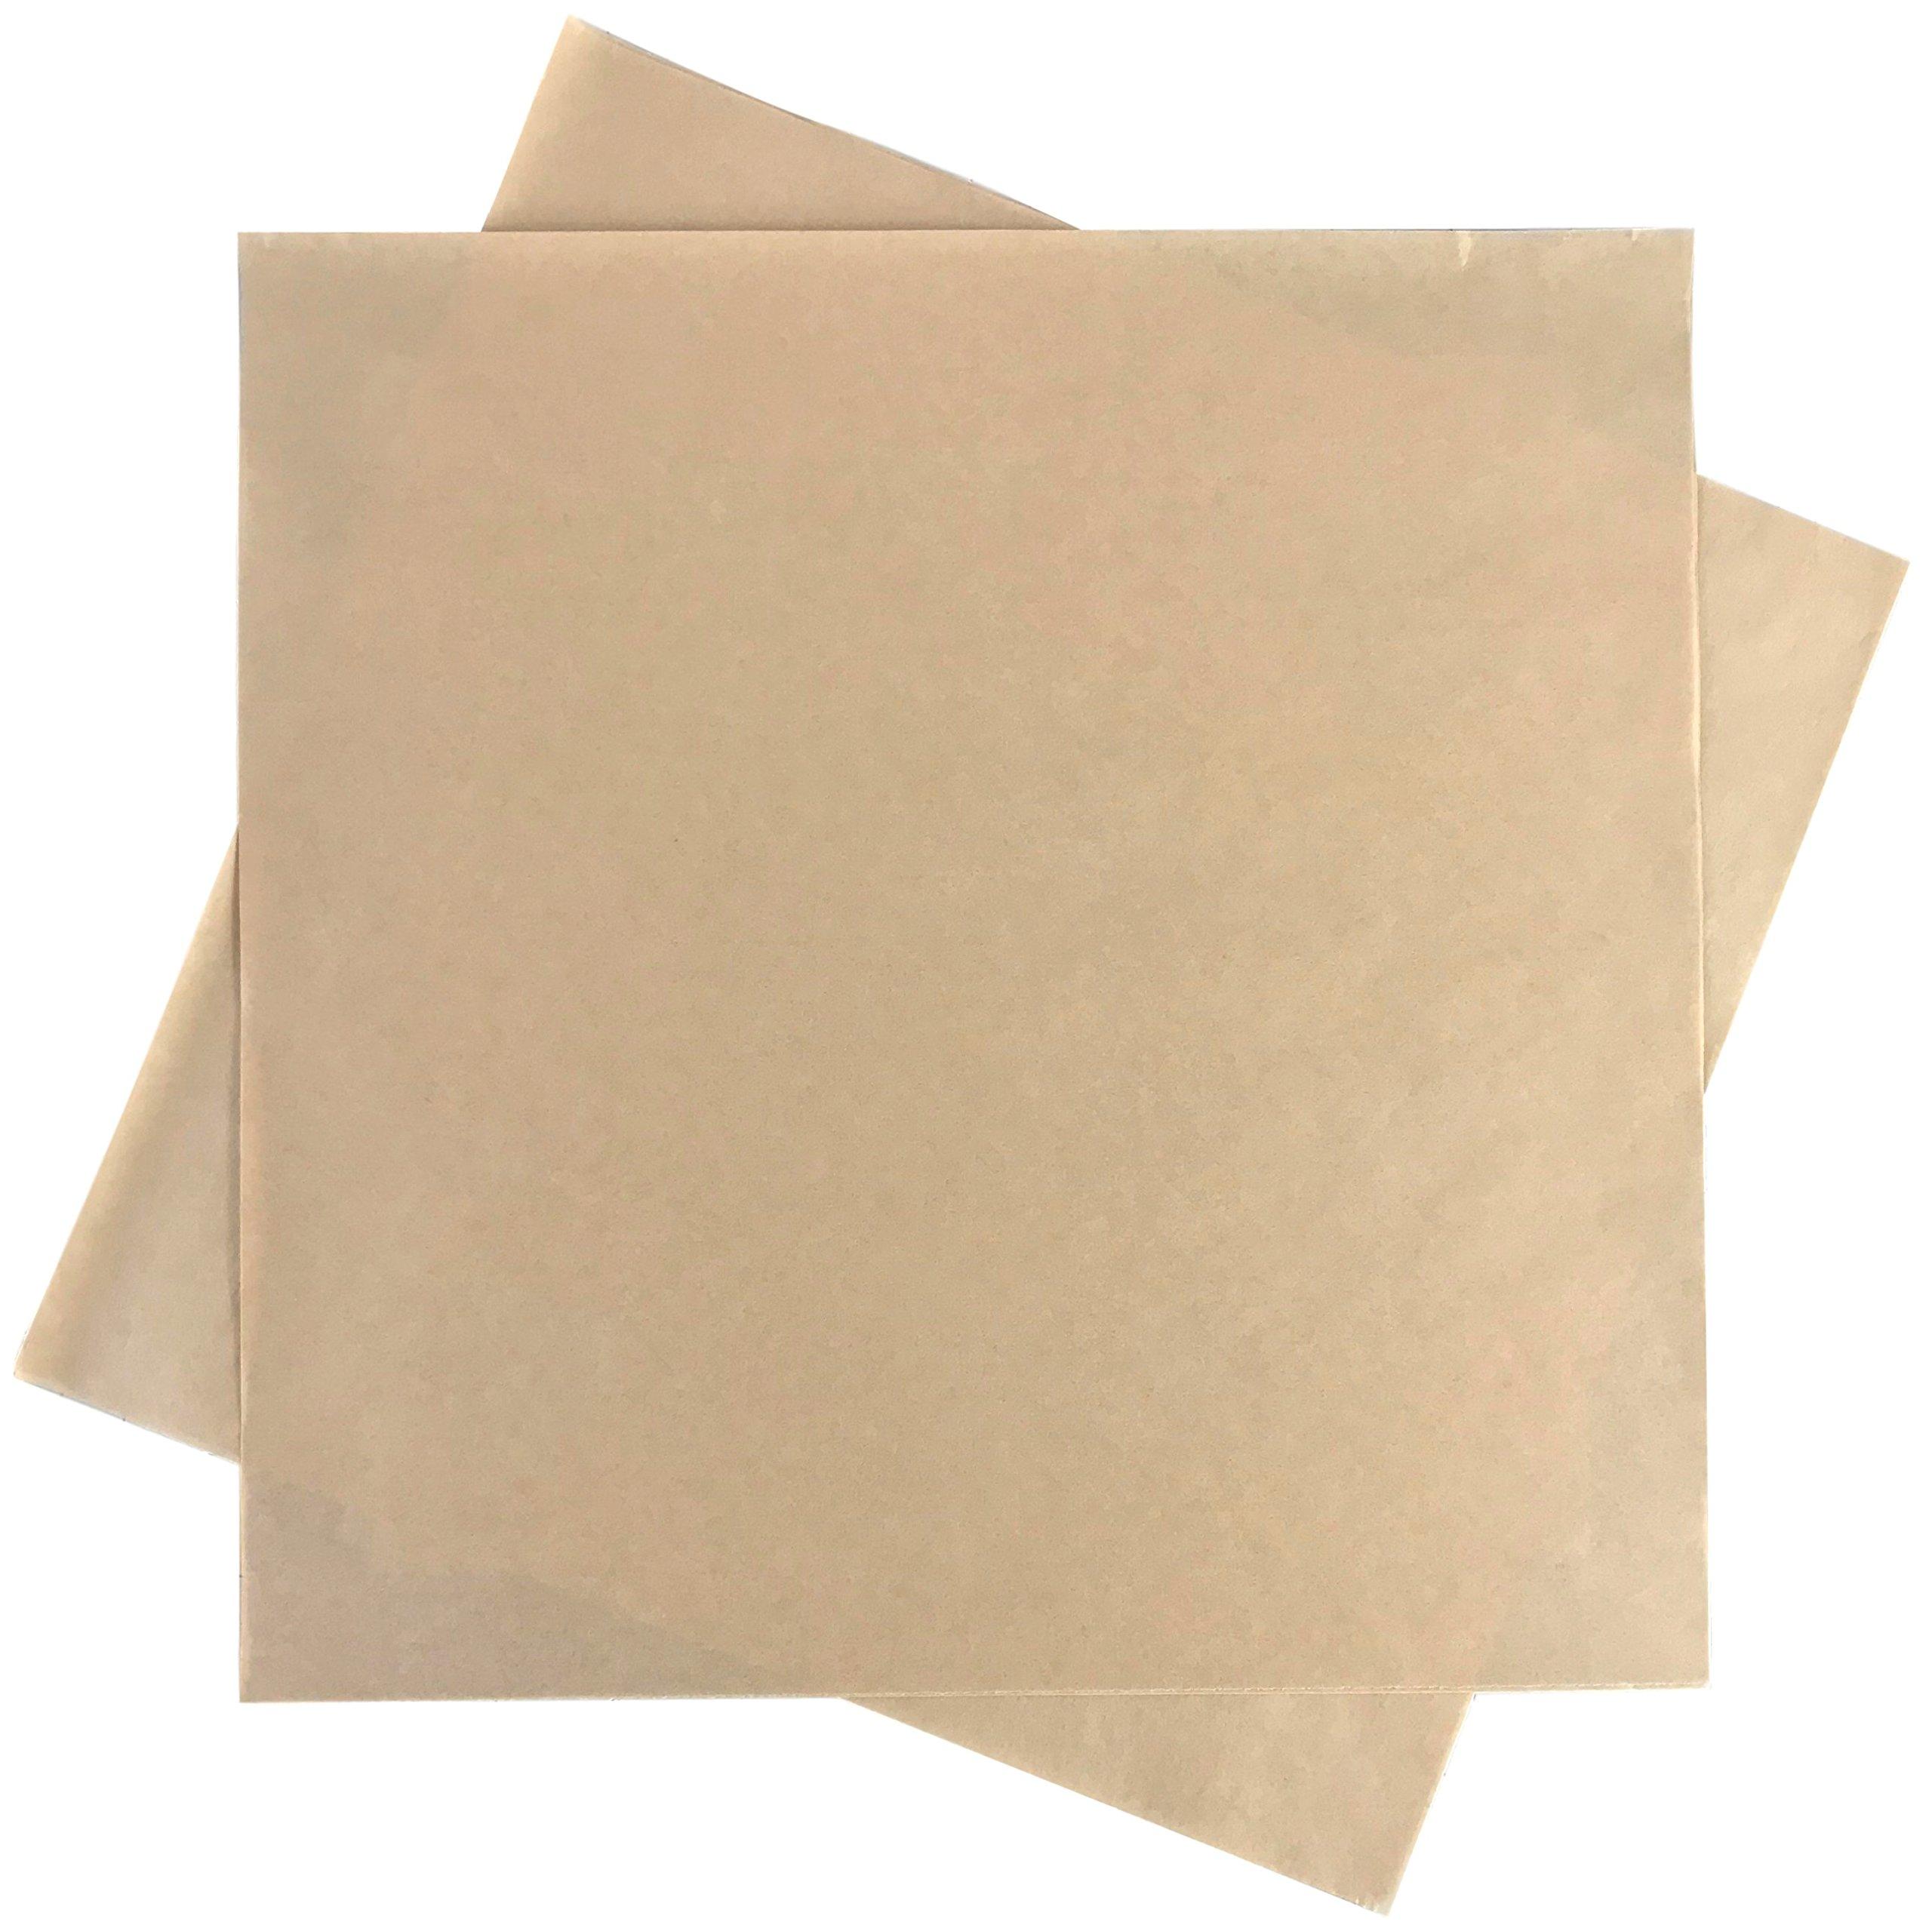 Deli Squares - Paper Sheets (12'' x 12'') (Natural Brown - 1,000 Sheets)